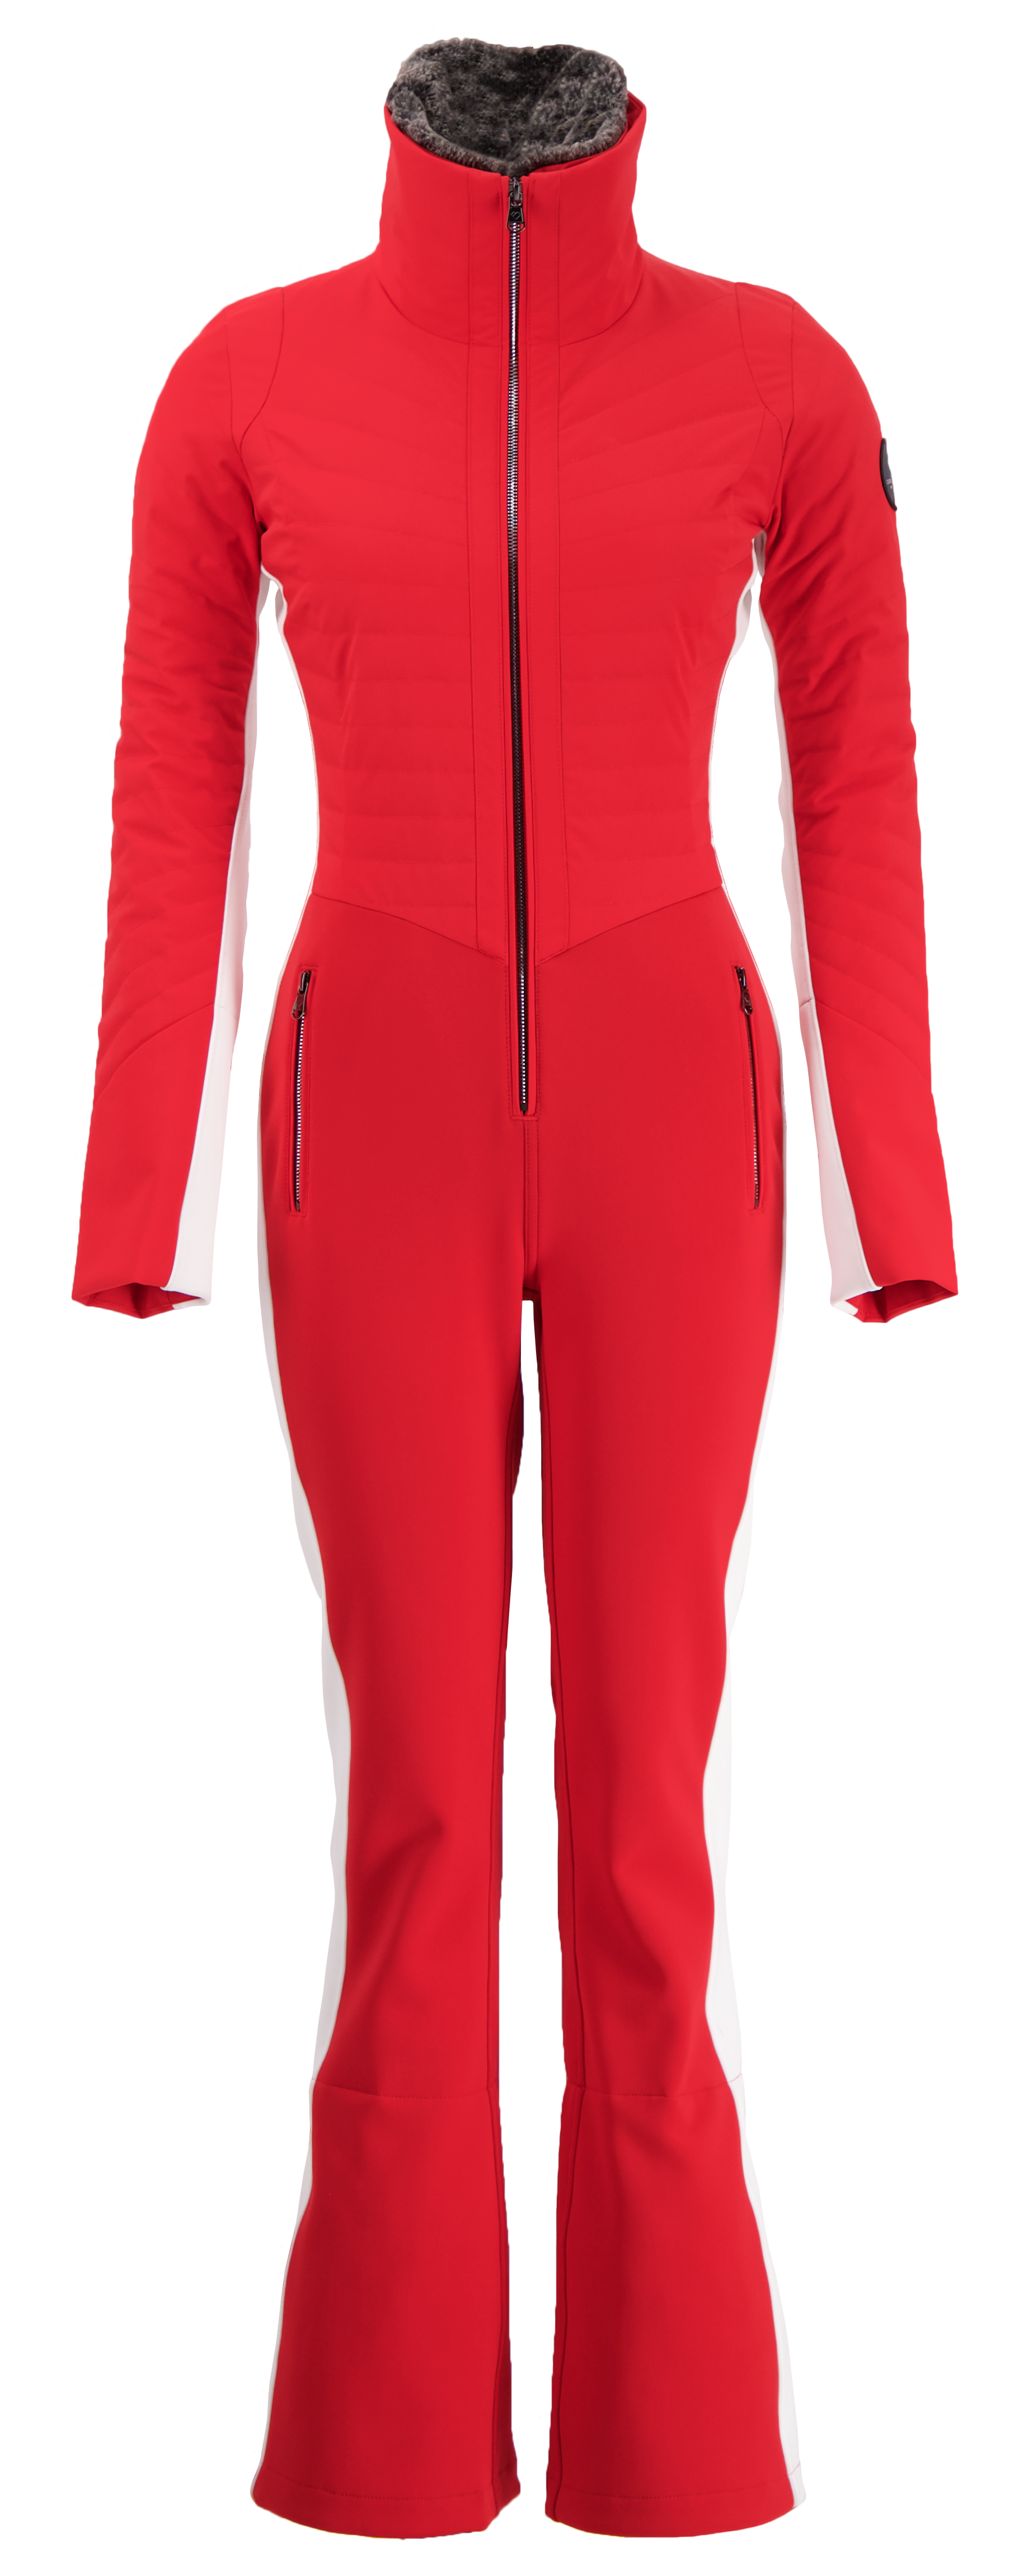 Ski Test Roster